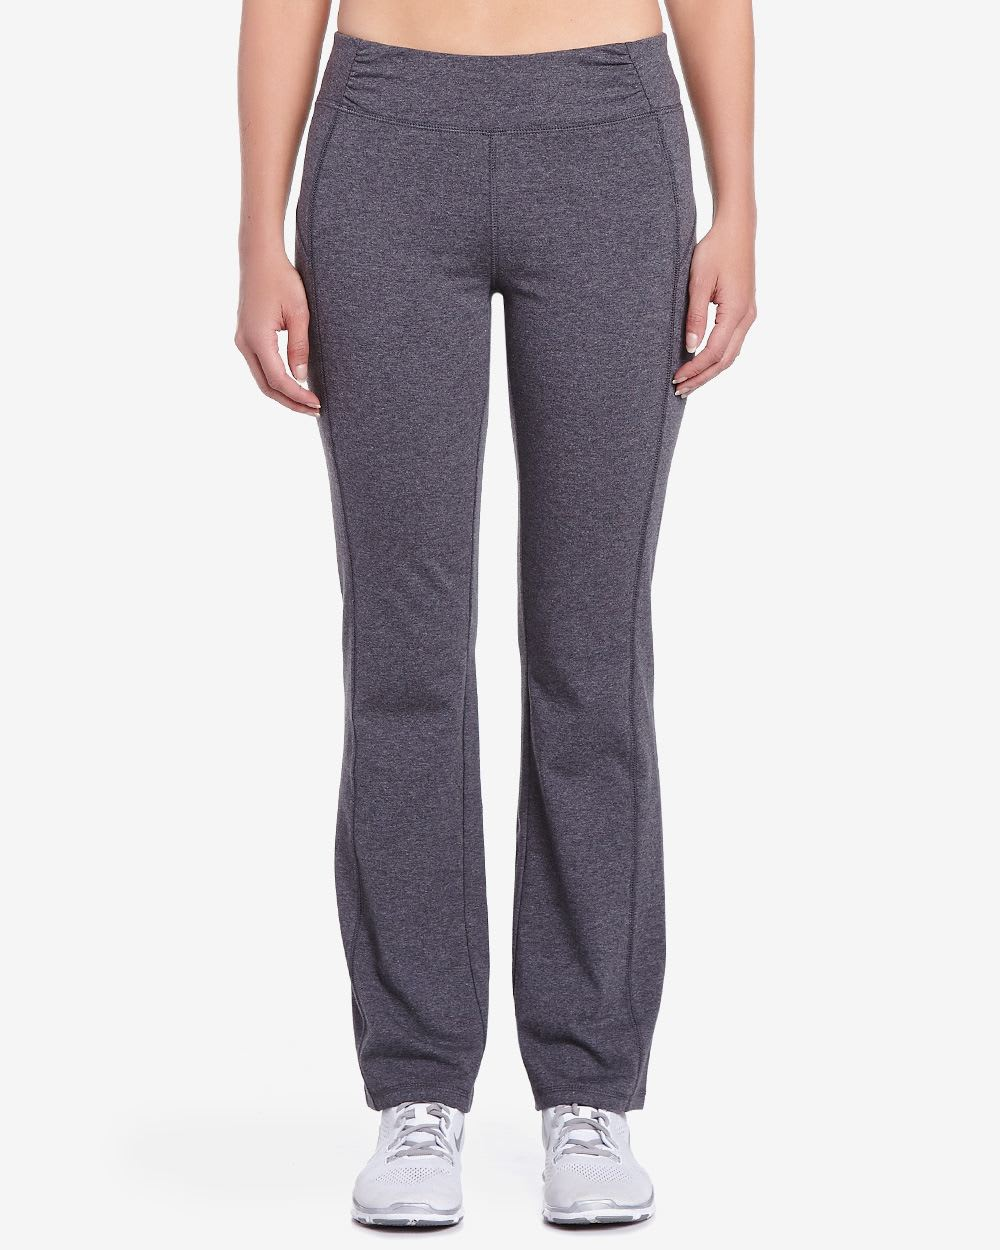 4a7cc4383fe1f Hyba Petite Yoga Pant | Petites | Reitmans